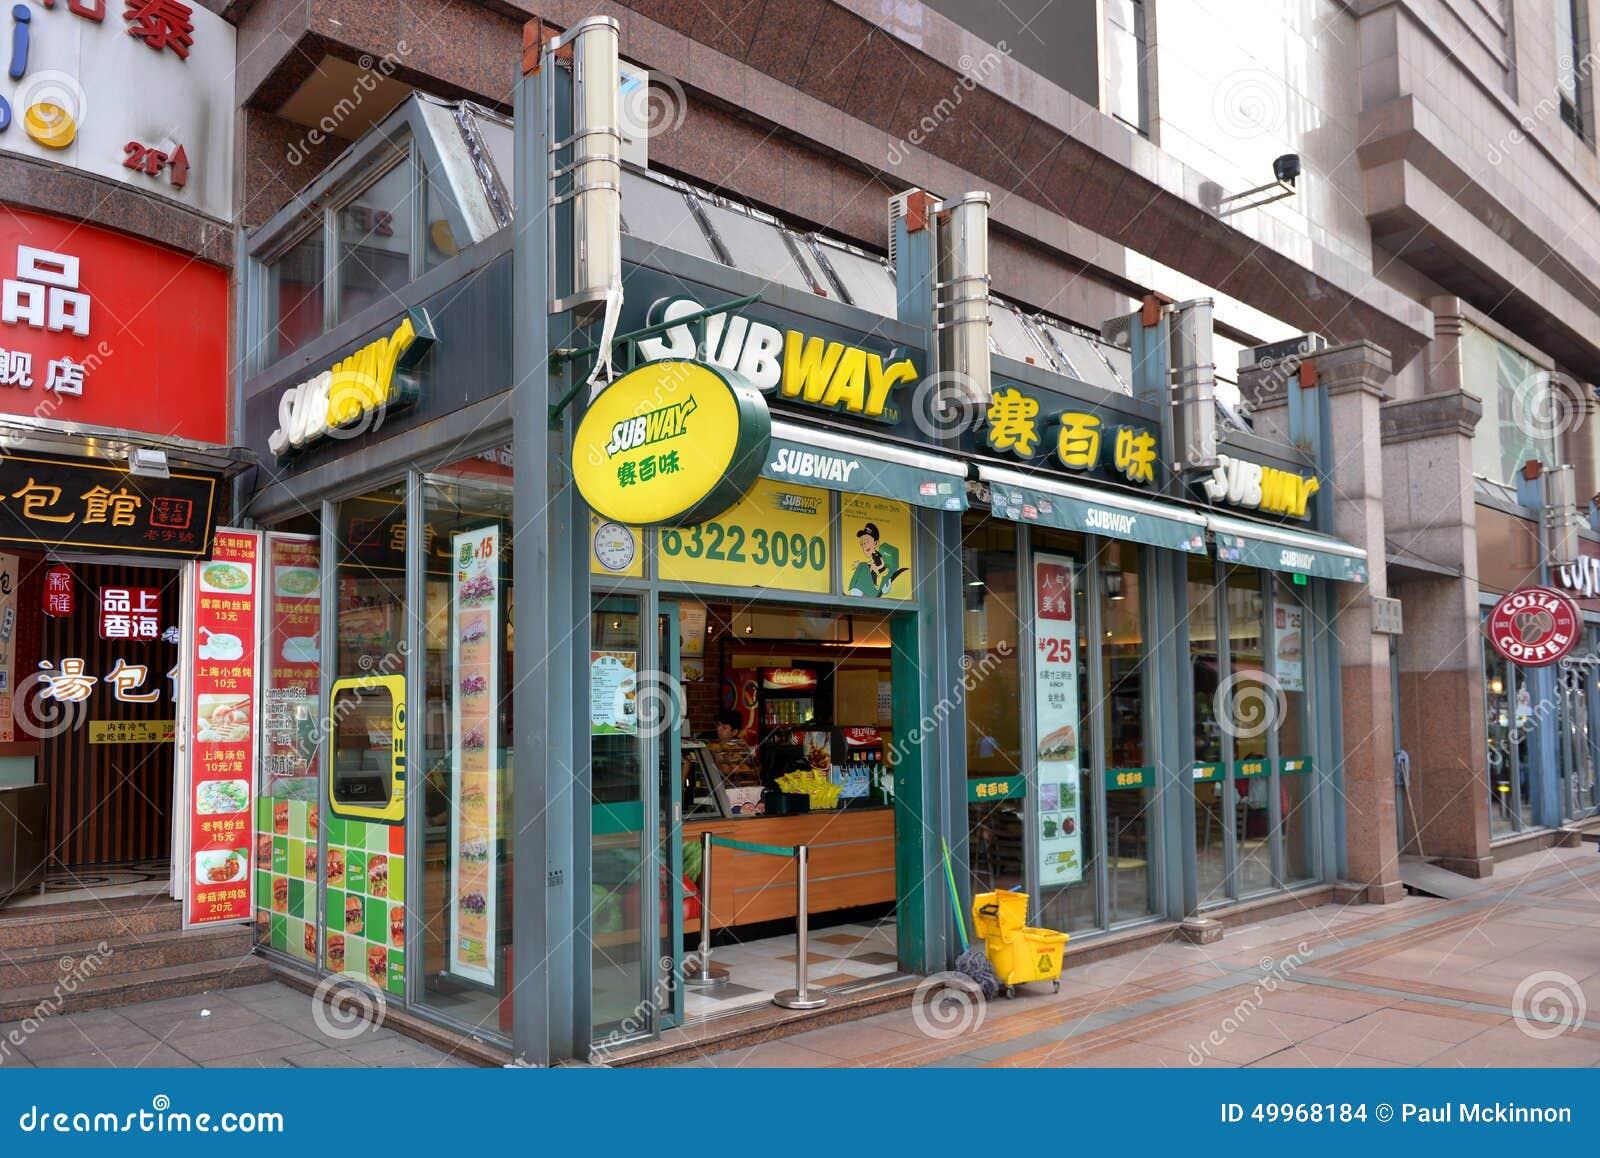 Subway store nanjing road shanghai editorial stock image for 18 8 salon franchise